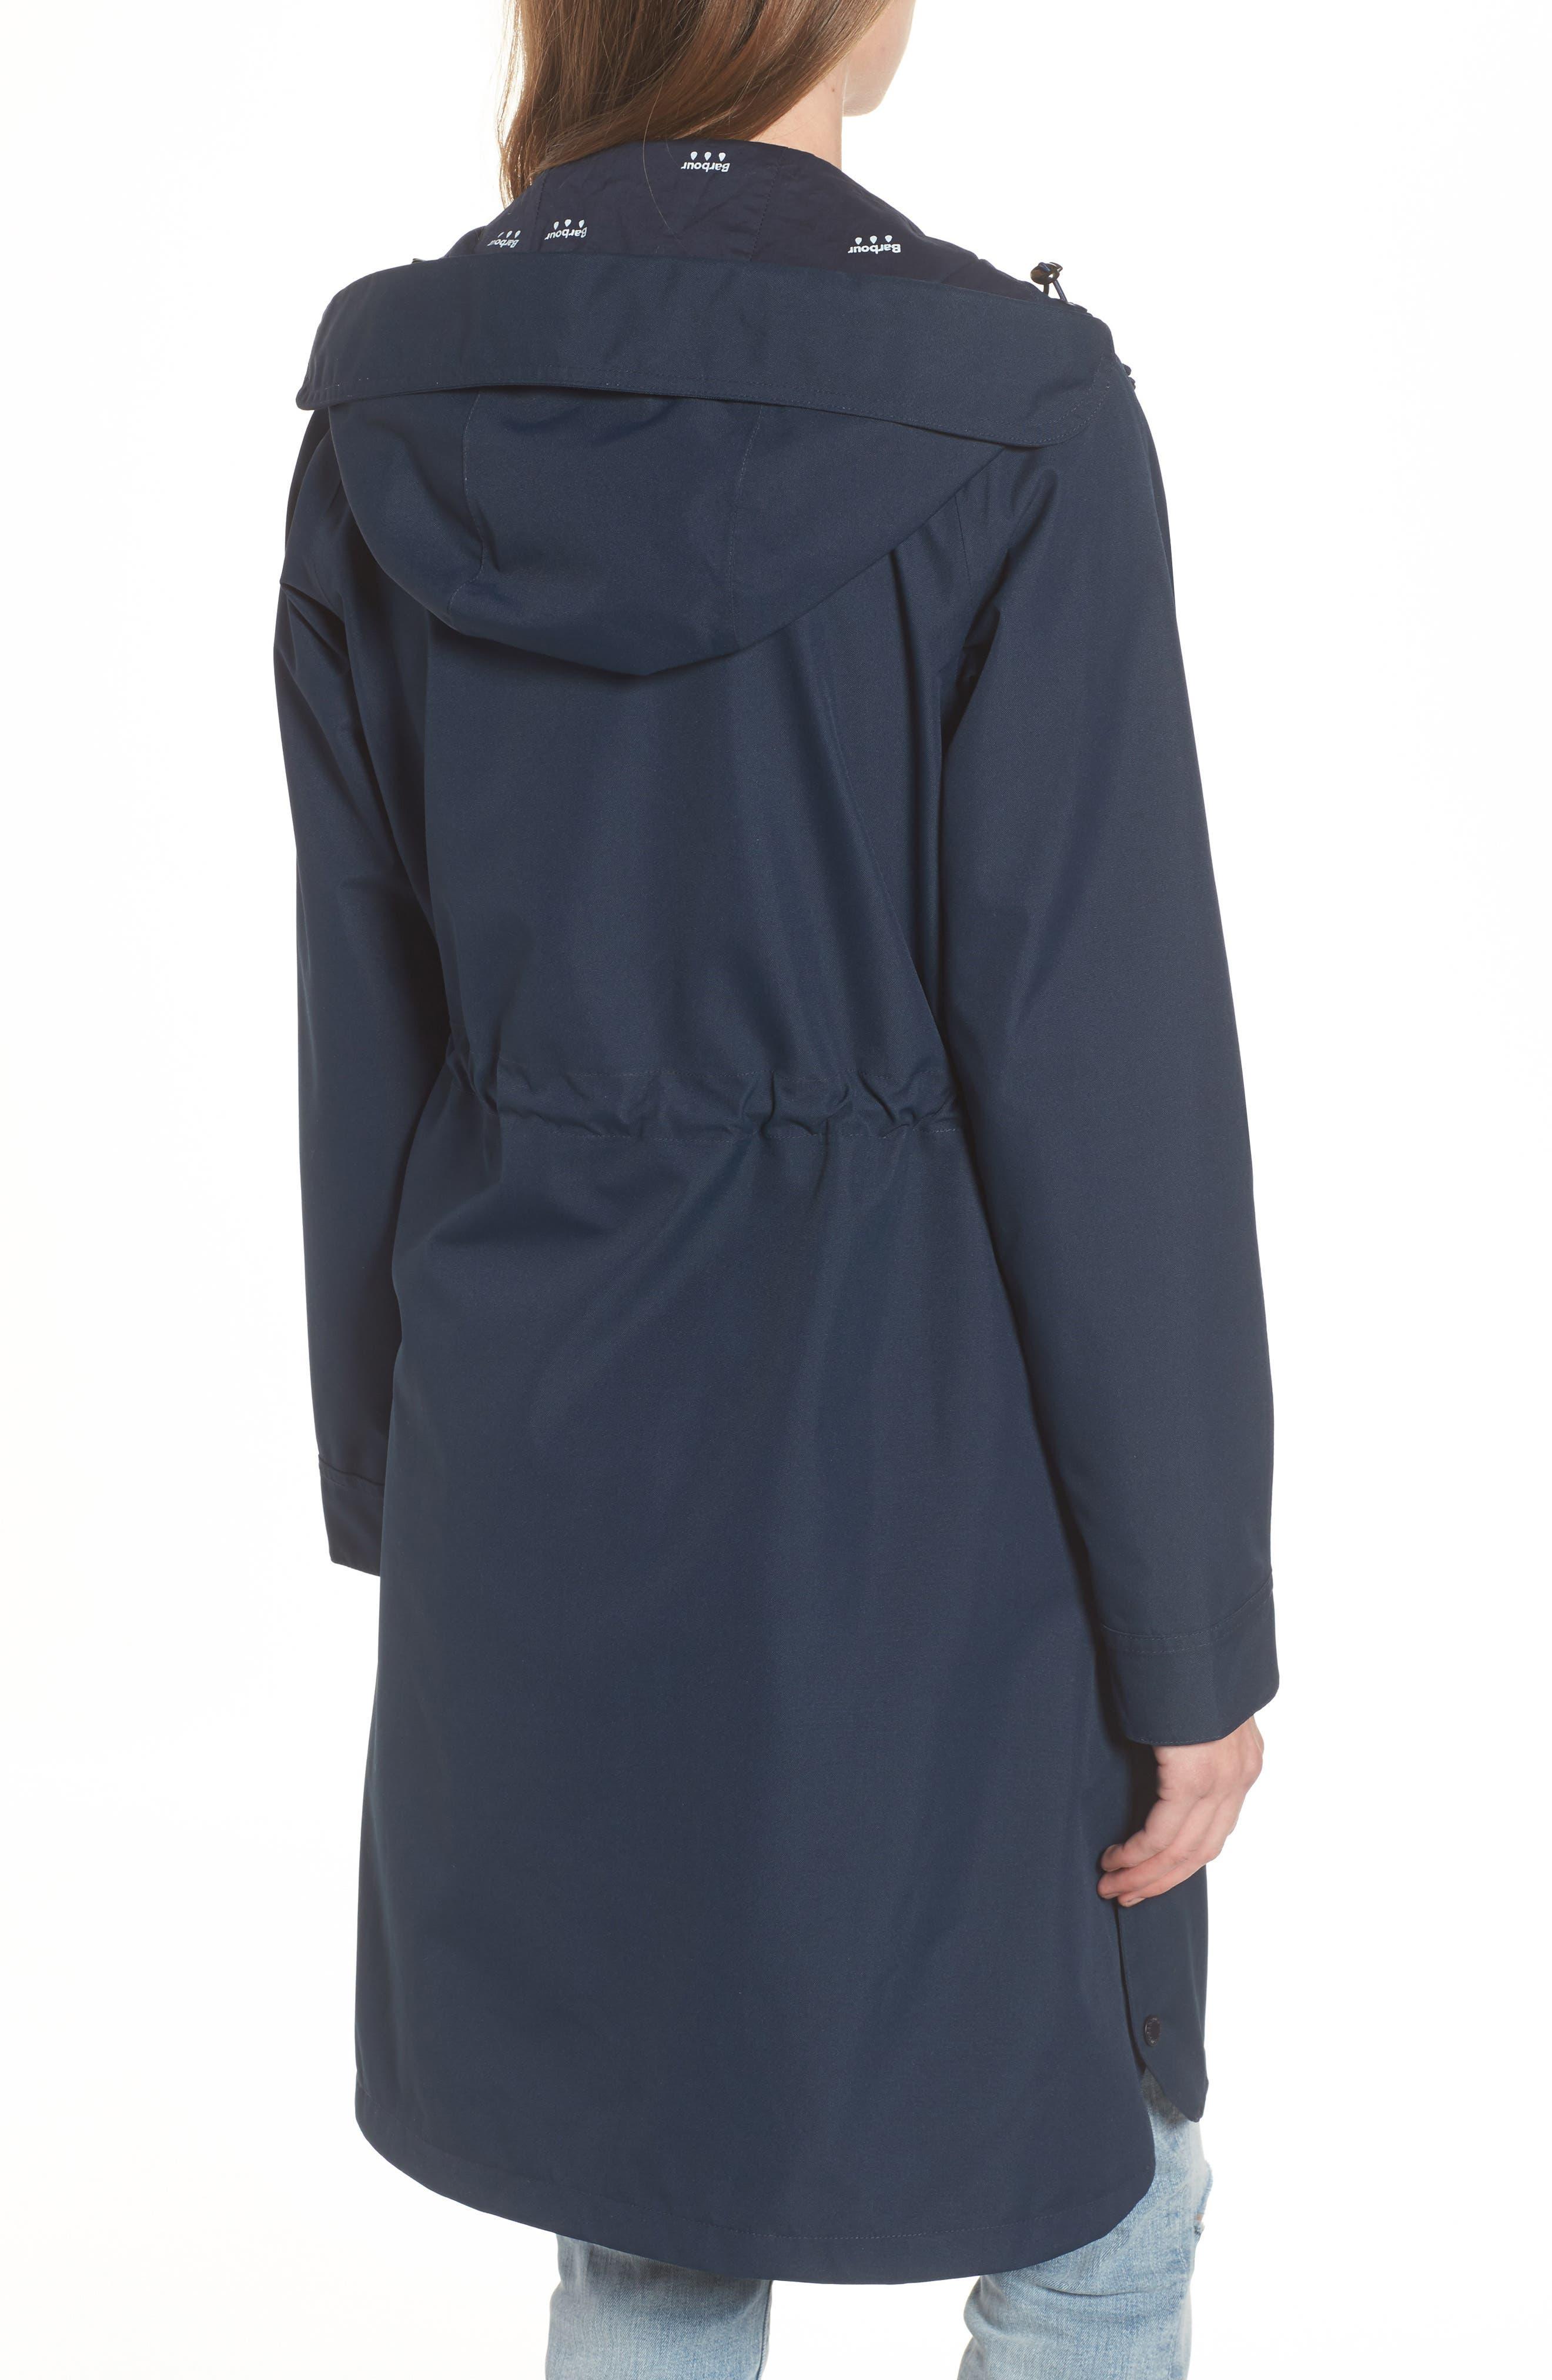 Sleet Hooded Jacket,                             Alternate thumbnail 4, color,